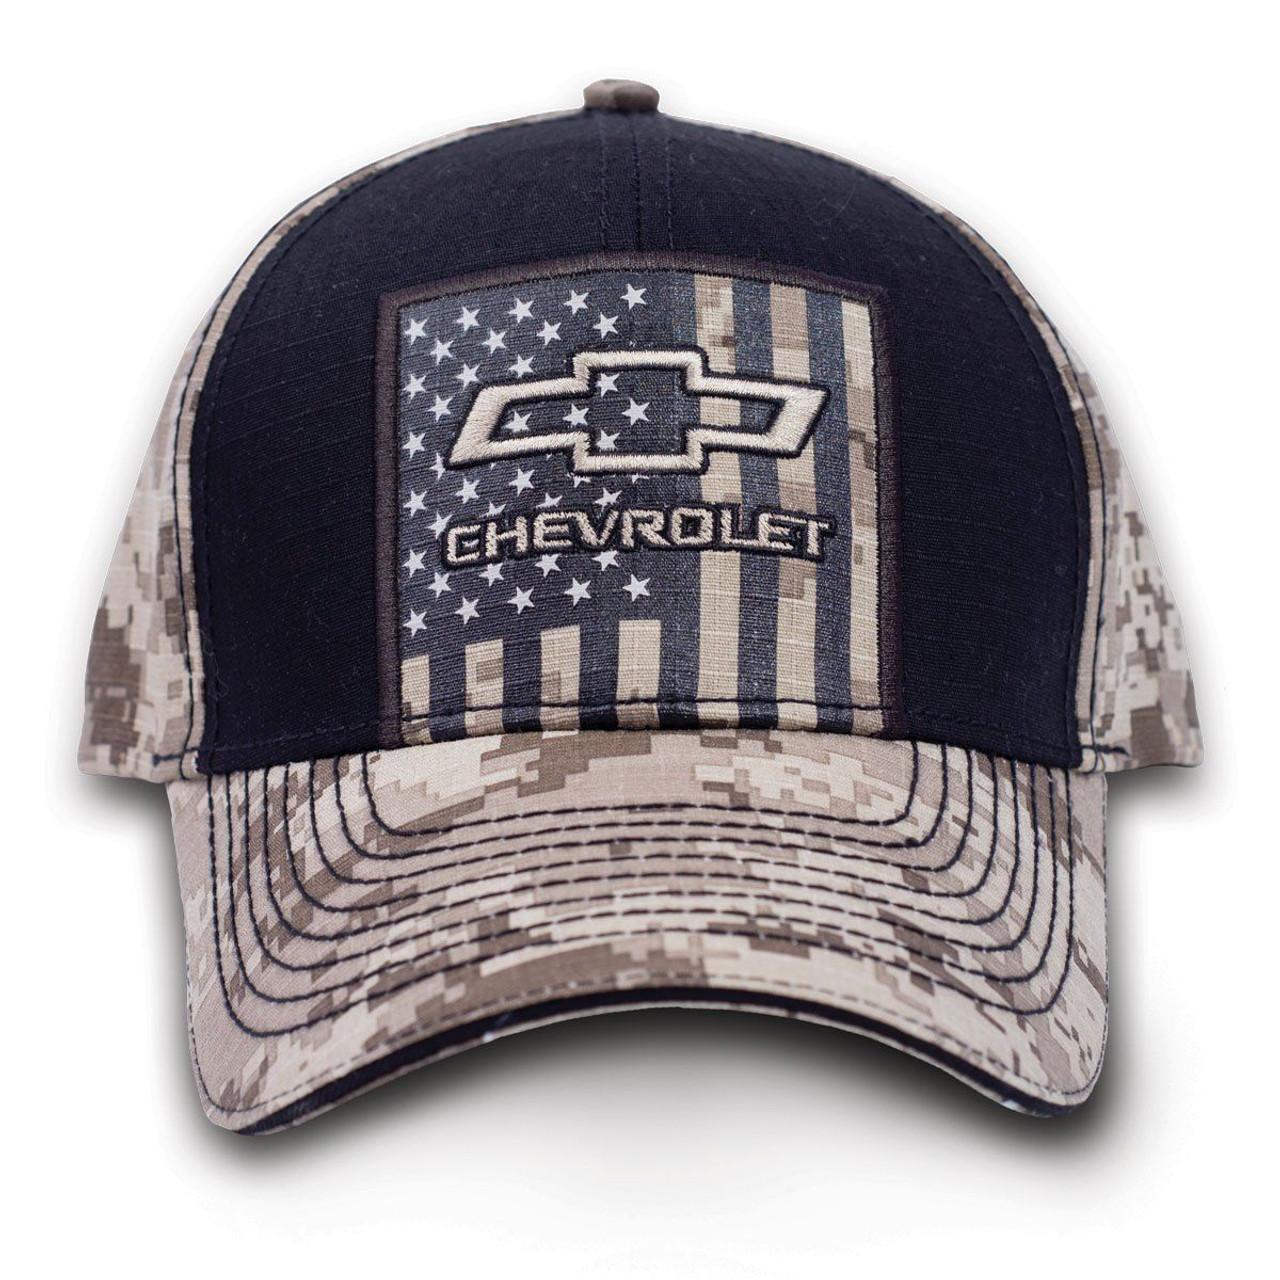 Buck Wear Chevy Tan Digital Camouflage Hat Cap American Flag USA Adjustable  - Fearless Apparel cedc3ad5d0f